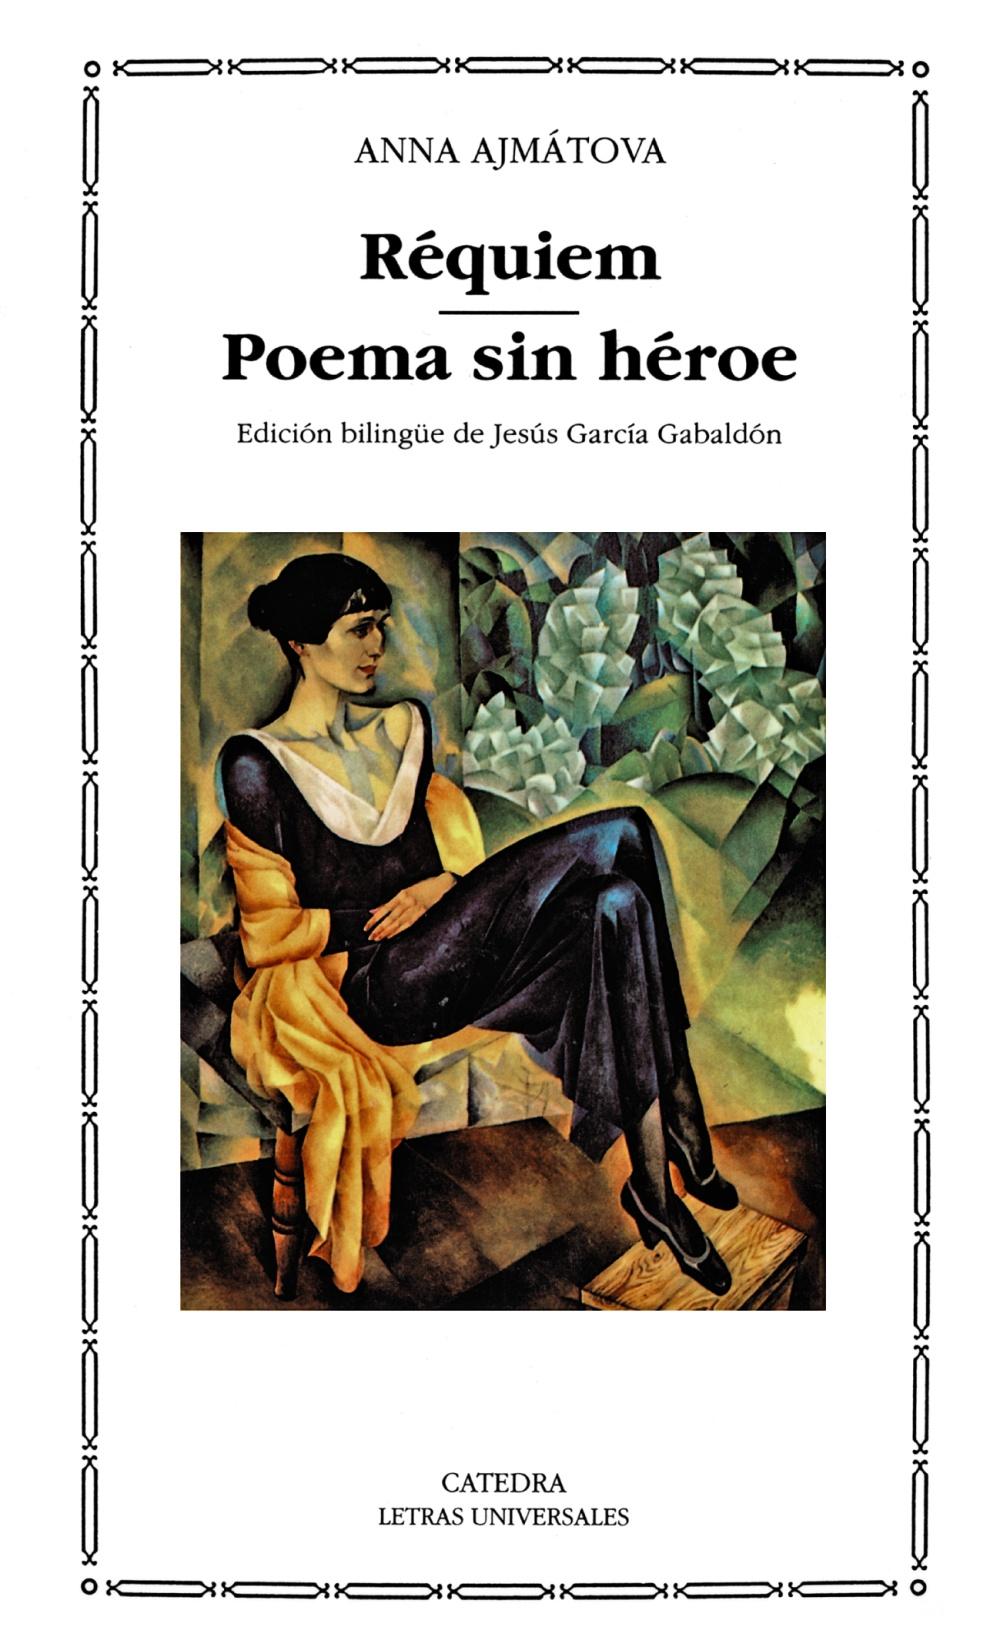 requiem-poema sin heroe-anna ajmatova-9788437612829